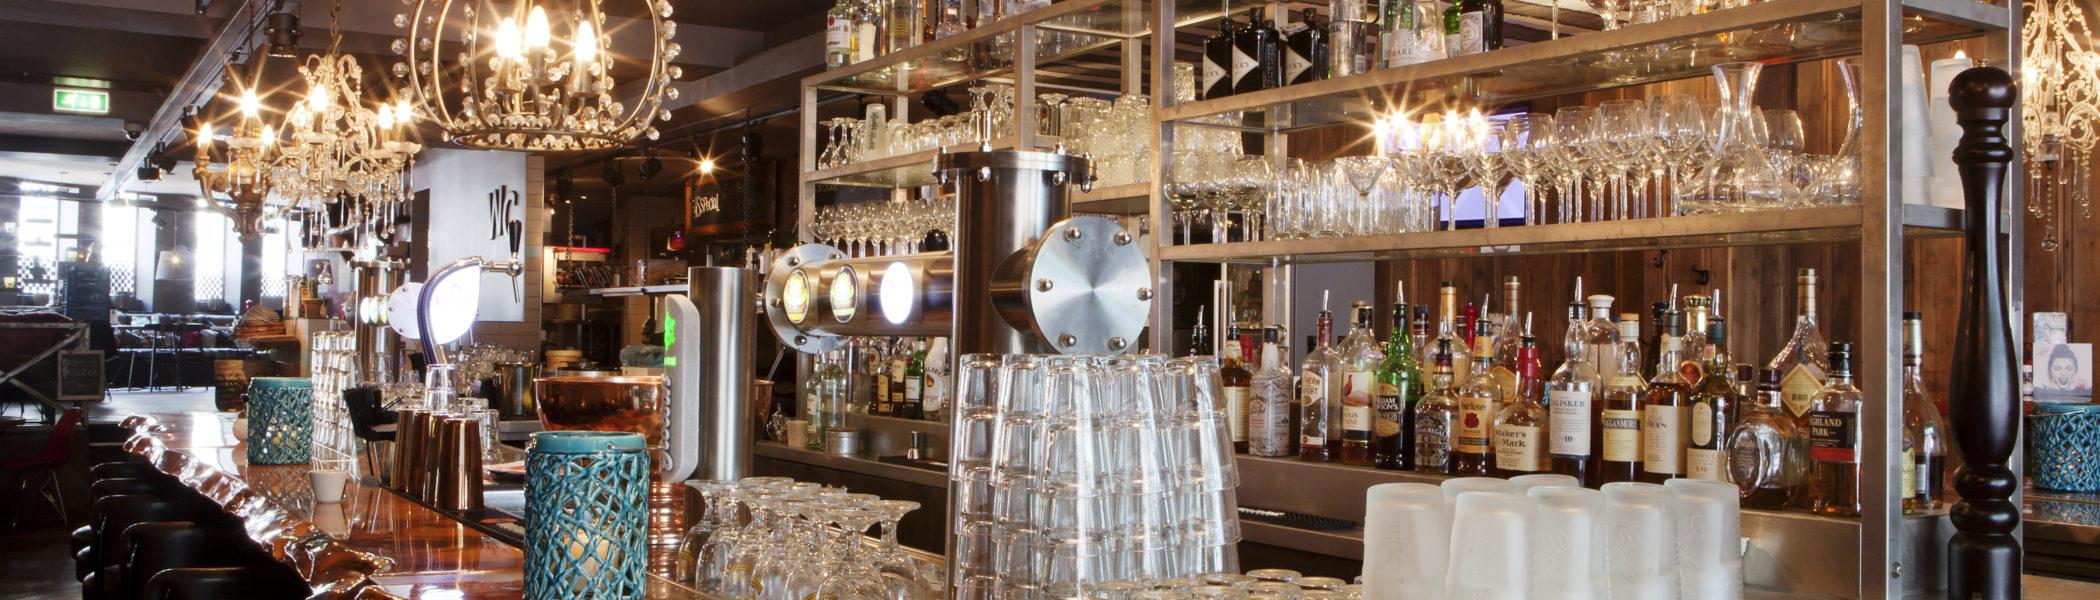 restaurant-zaandam-manzo-bar-bistro-bar-overdag